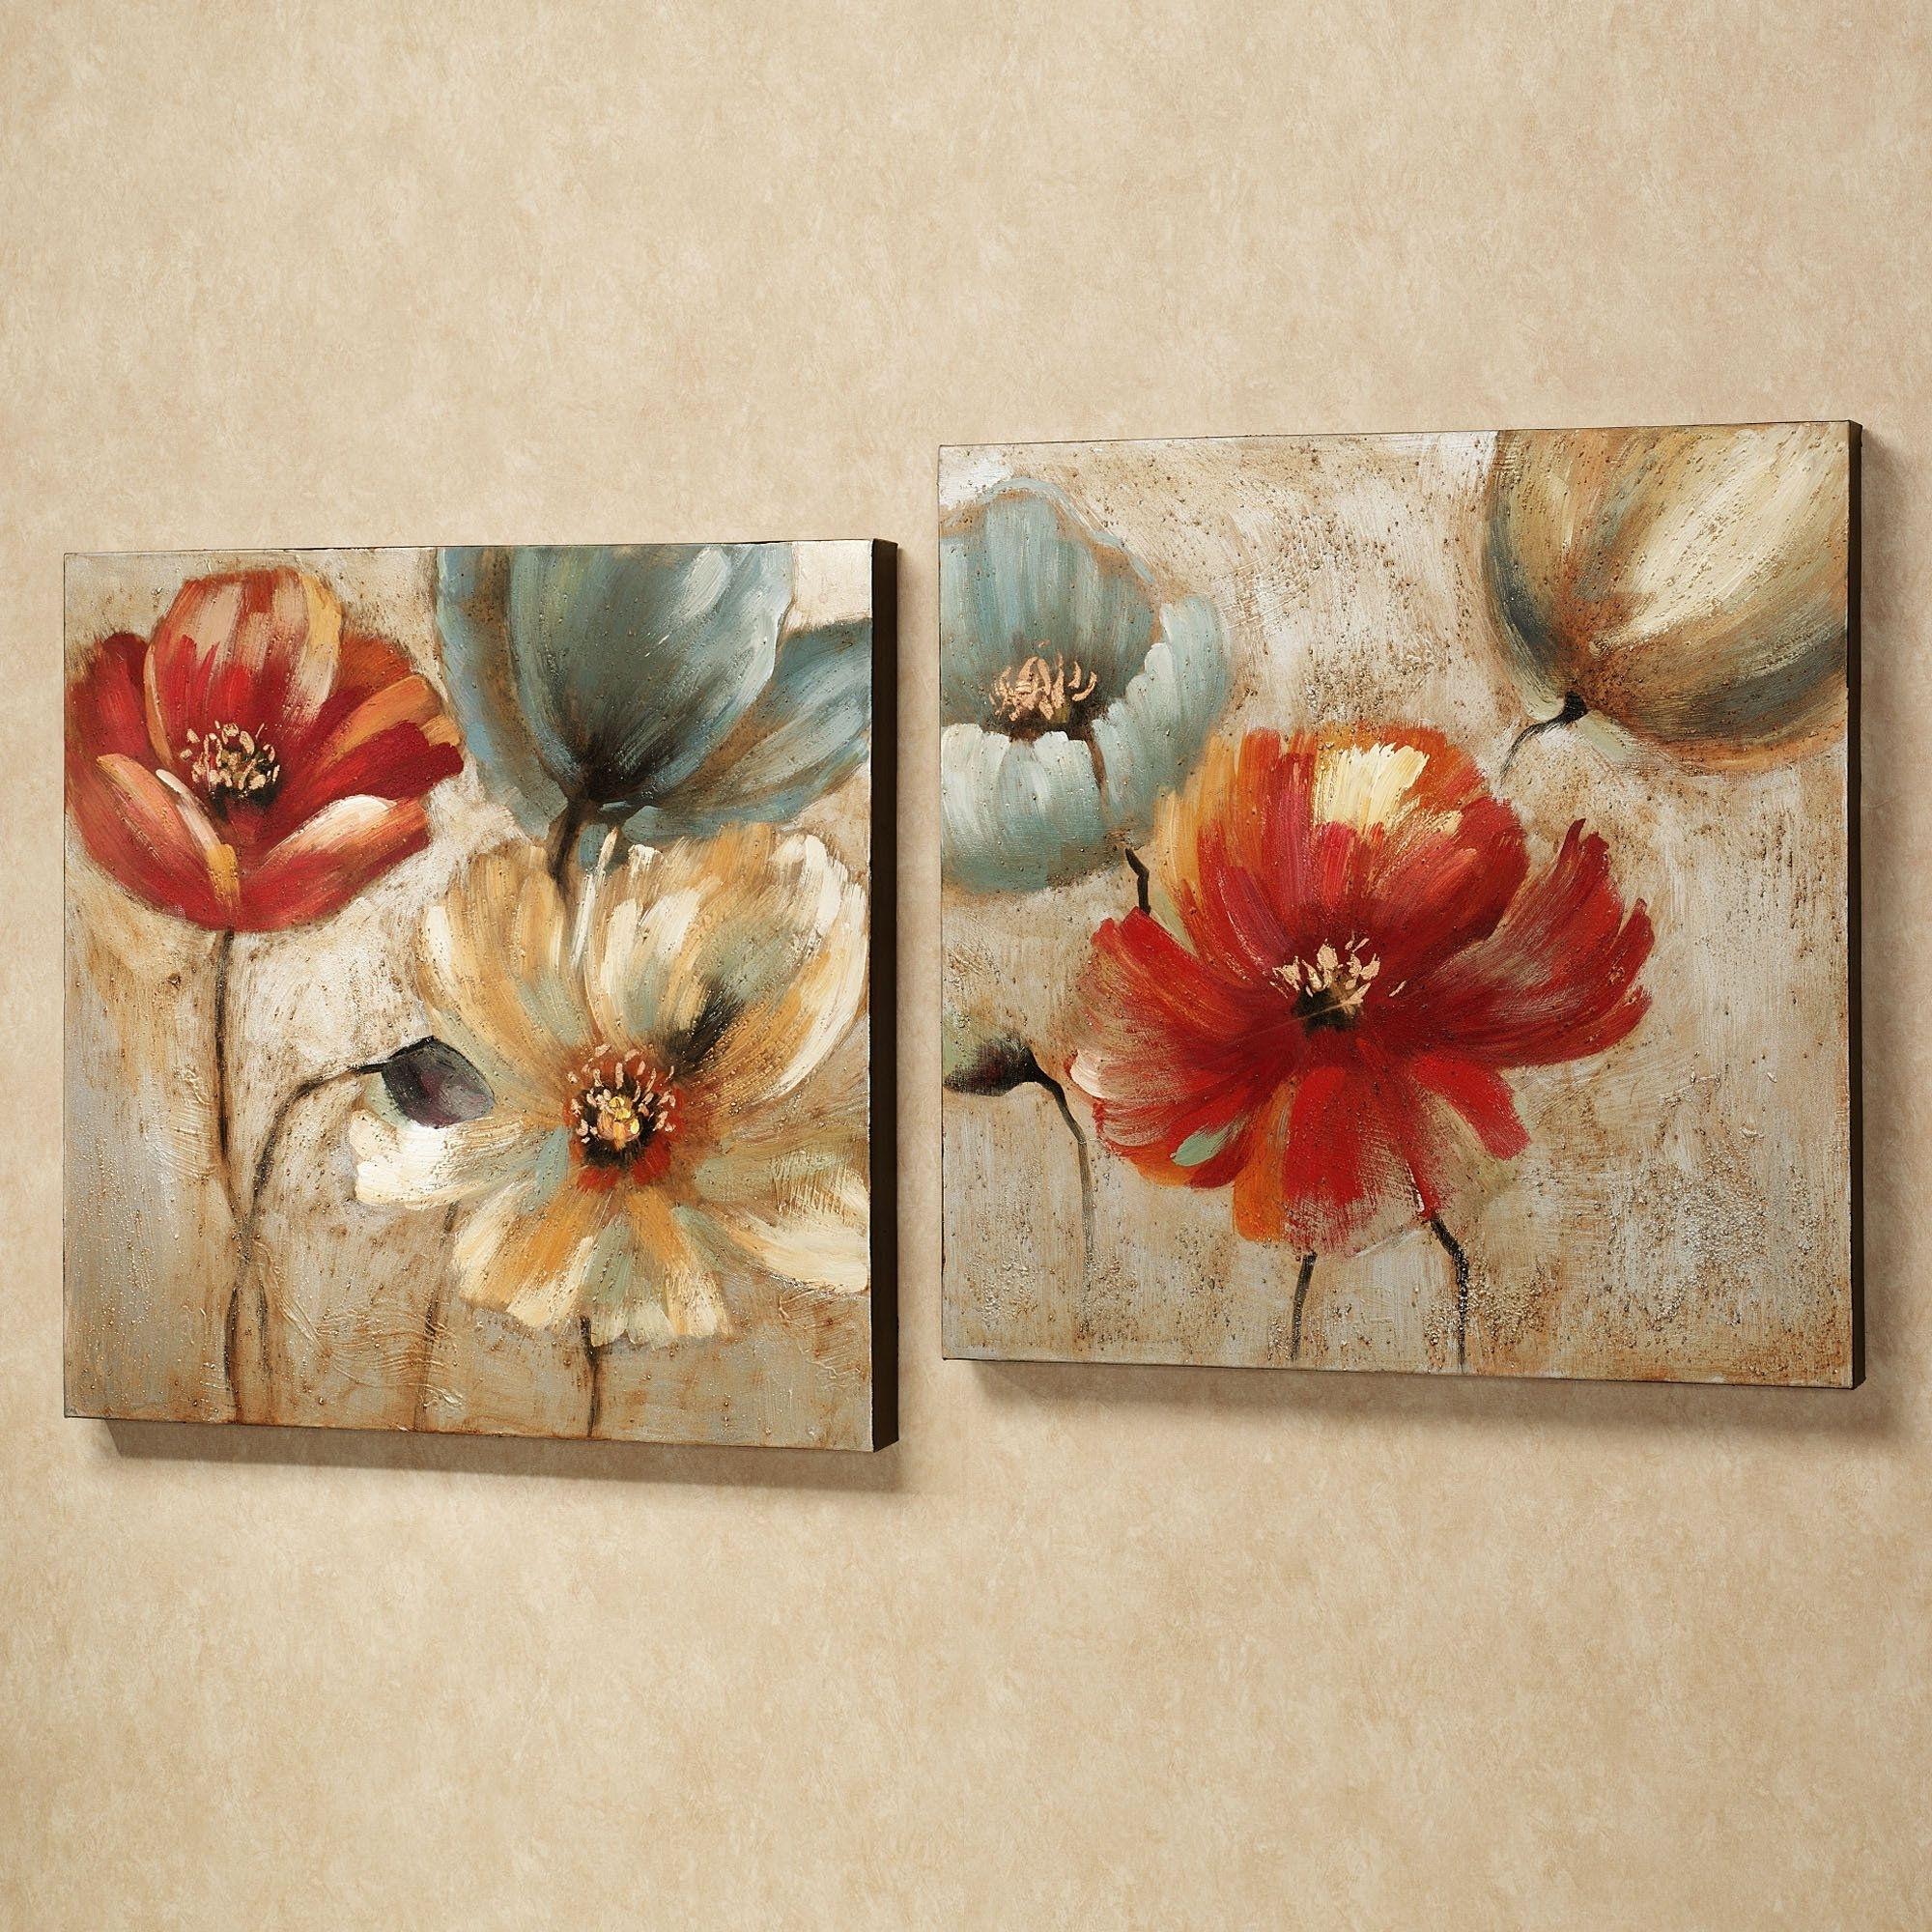 Floral Canvas Wall Art Inside Famous Joyful Garden Floral Canvas Wall Art Set (View 5 of 15)